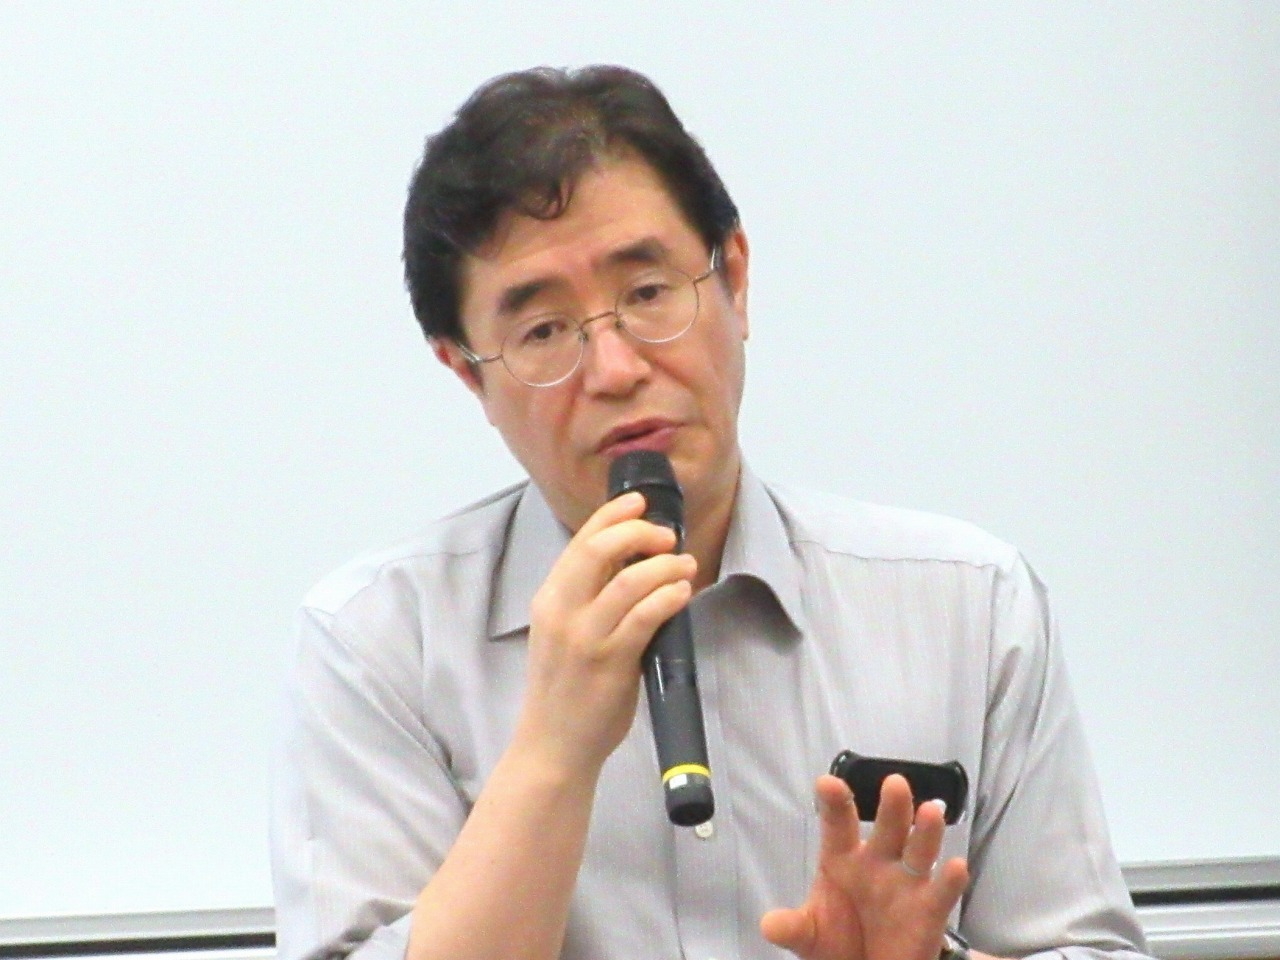 http://www.shinshu-u.ac.jp/faculty/econlaw/topics/images/s-IMG_0891.jpg